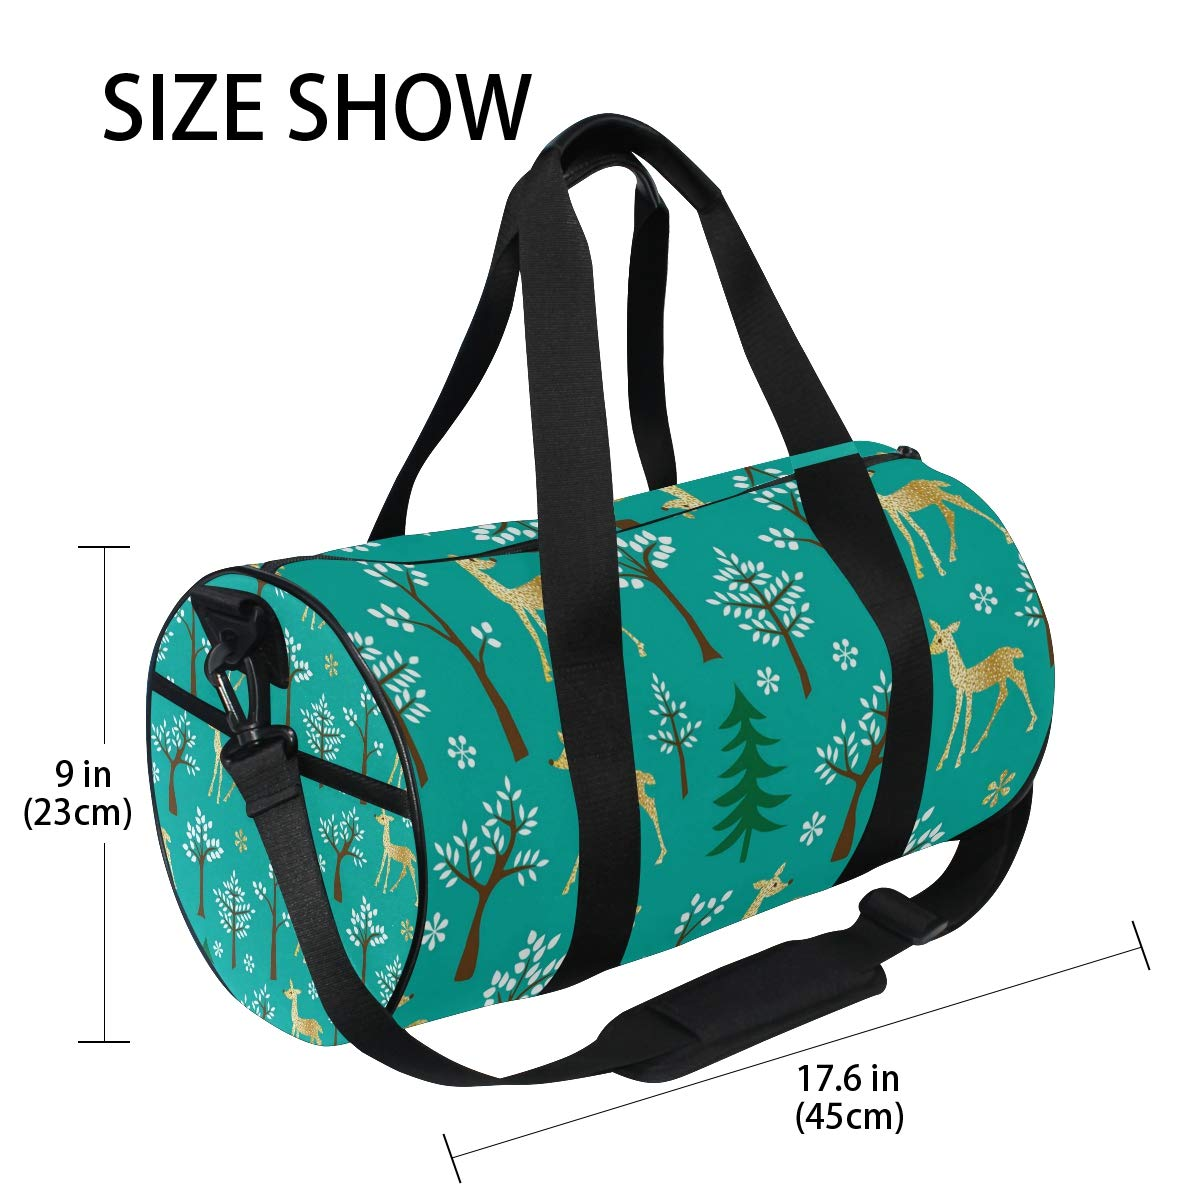 Sports Gym Duffel Barrel Bag Gold Glitter Deer Blue Travel Luggage Handbag for Men Women